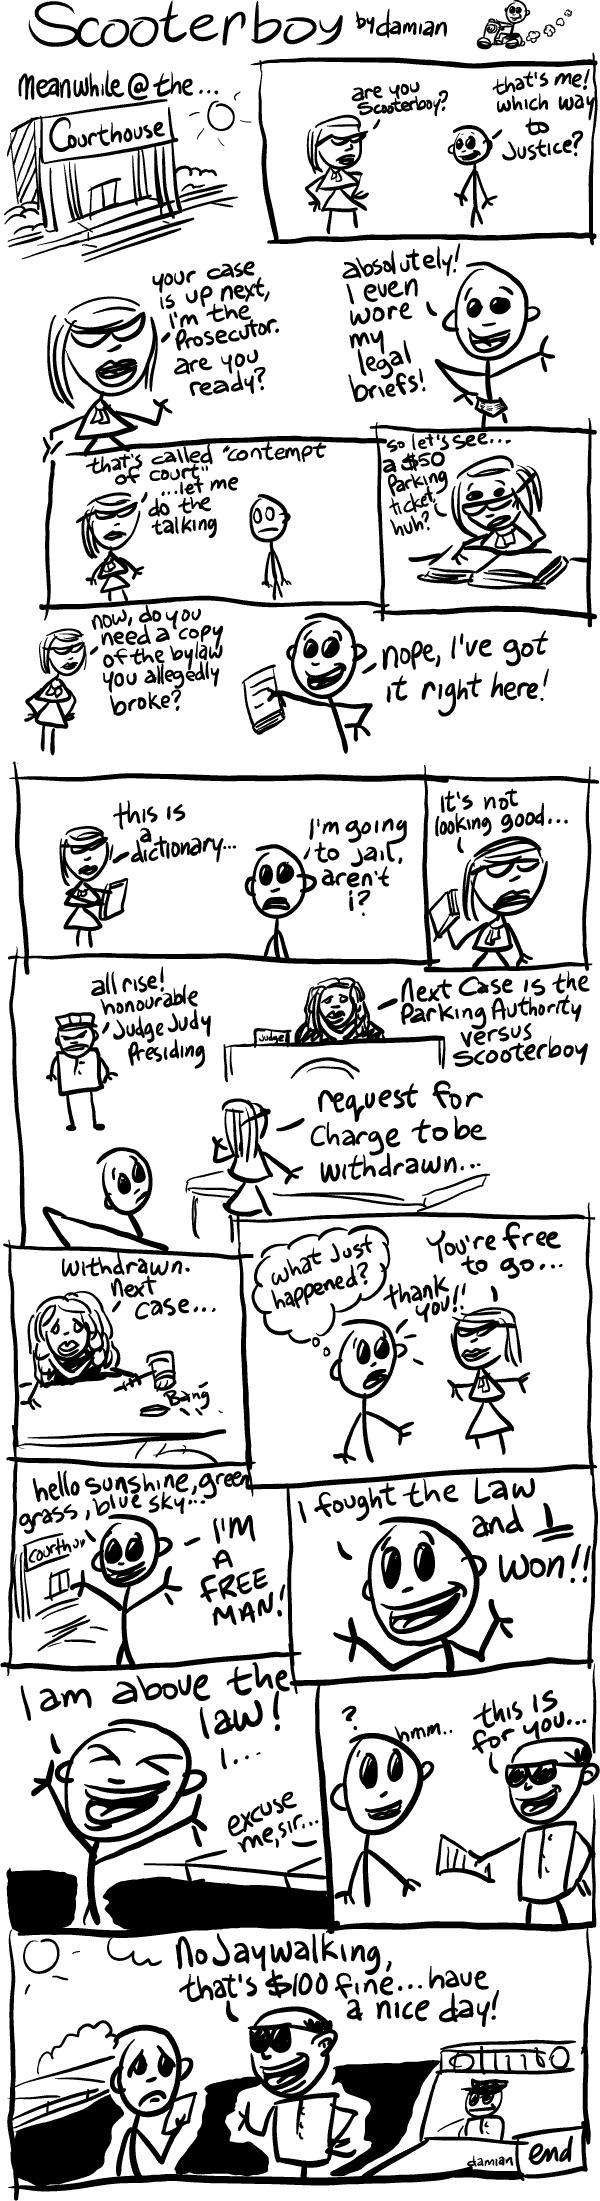 Scooterboy versus justice!